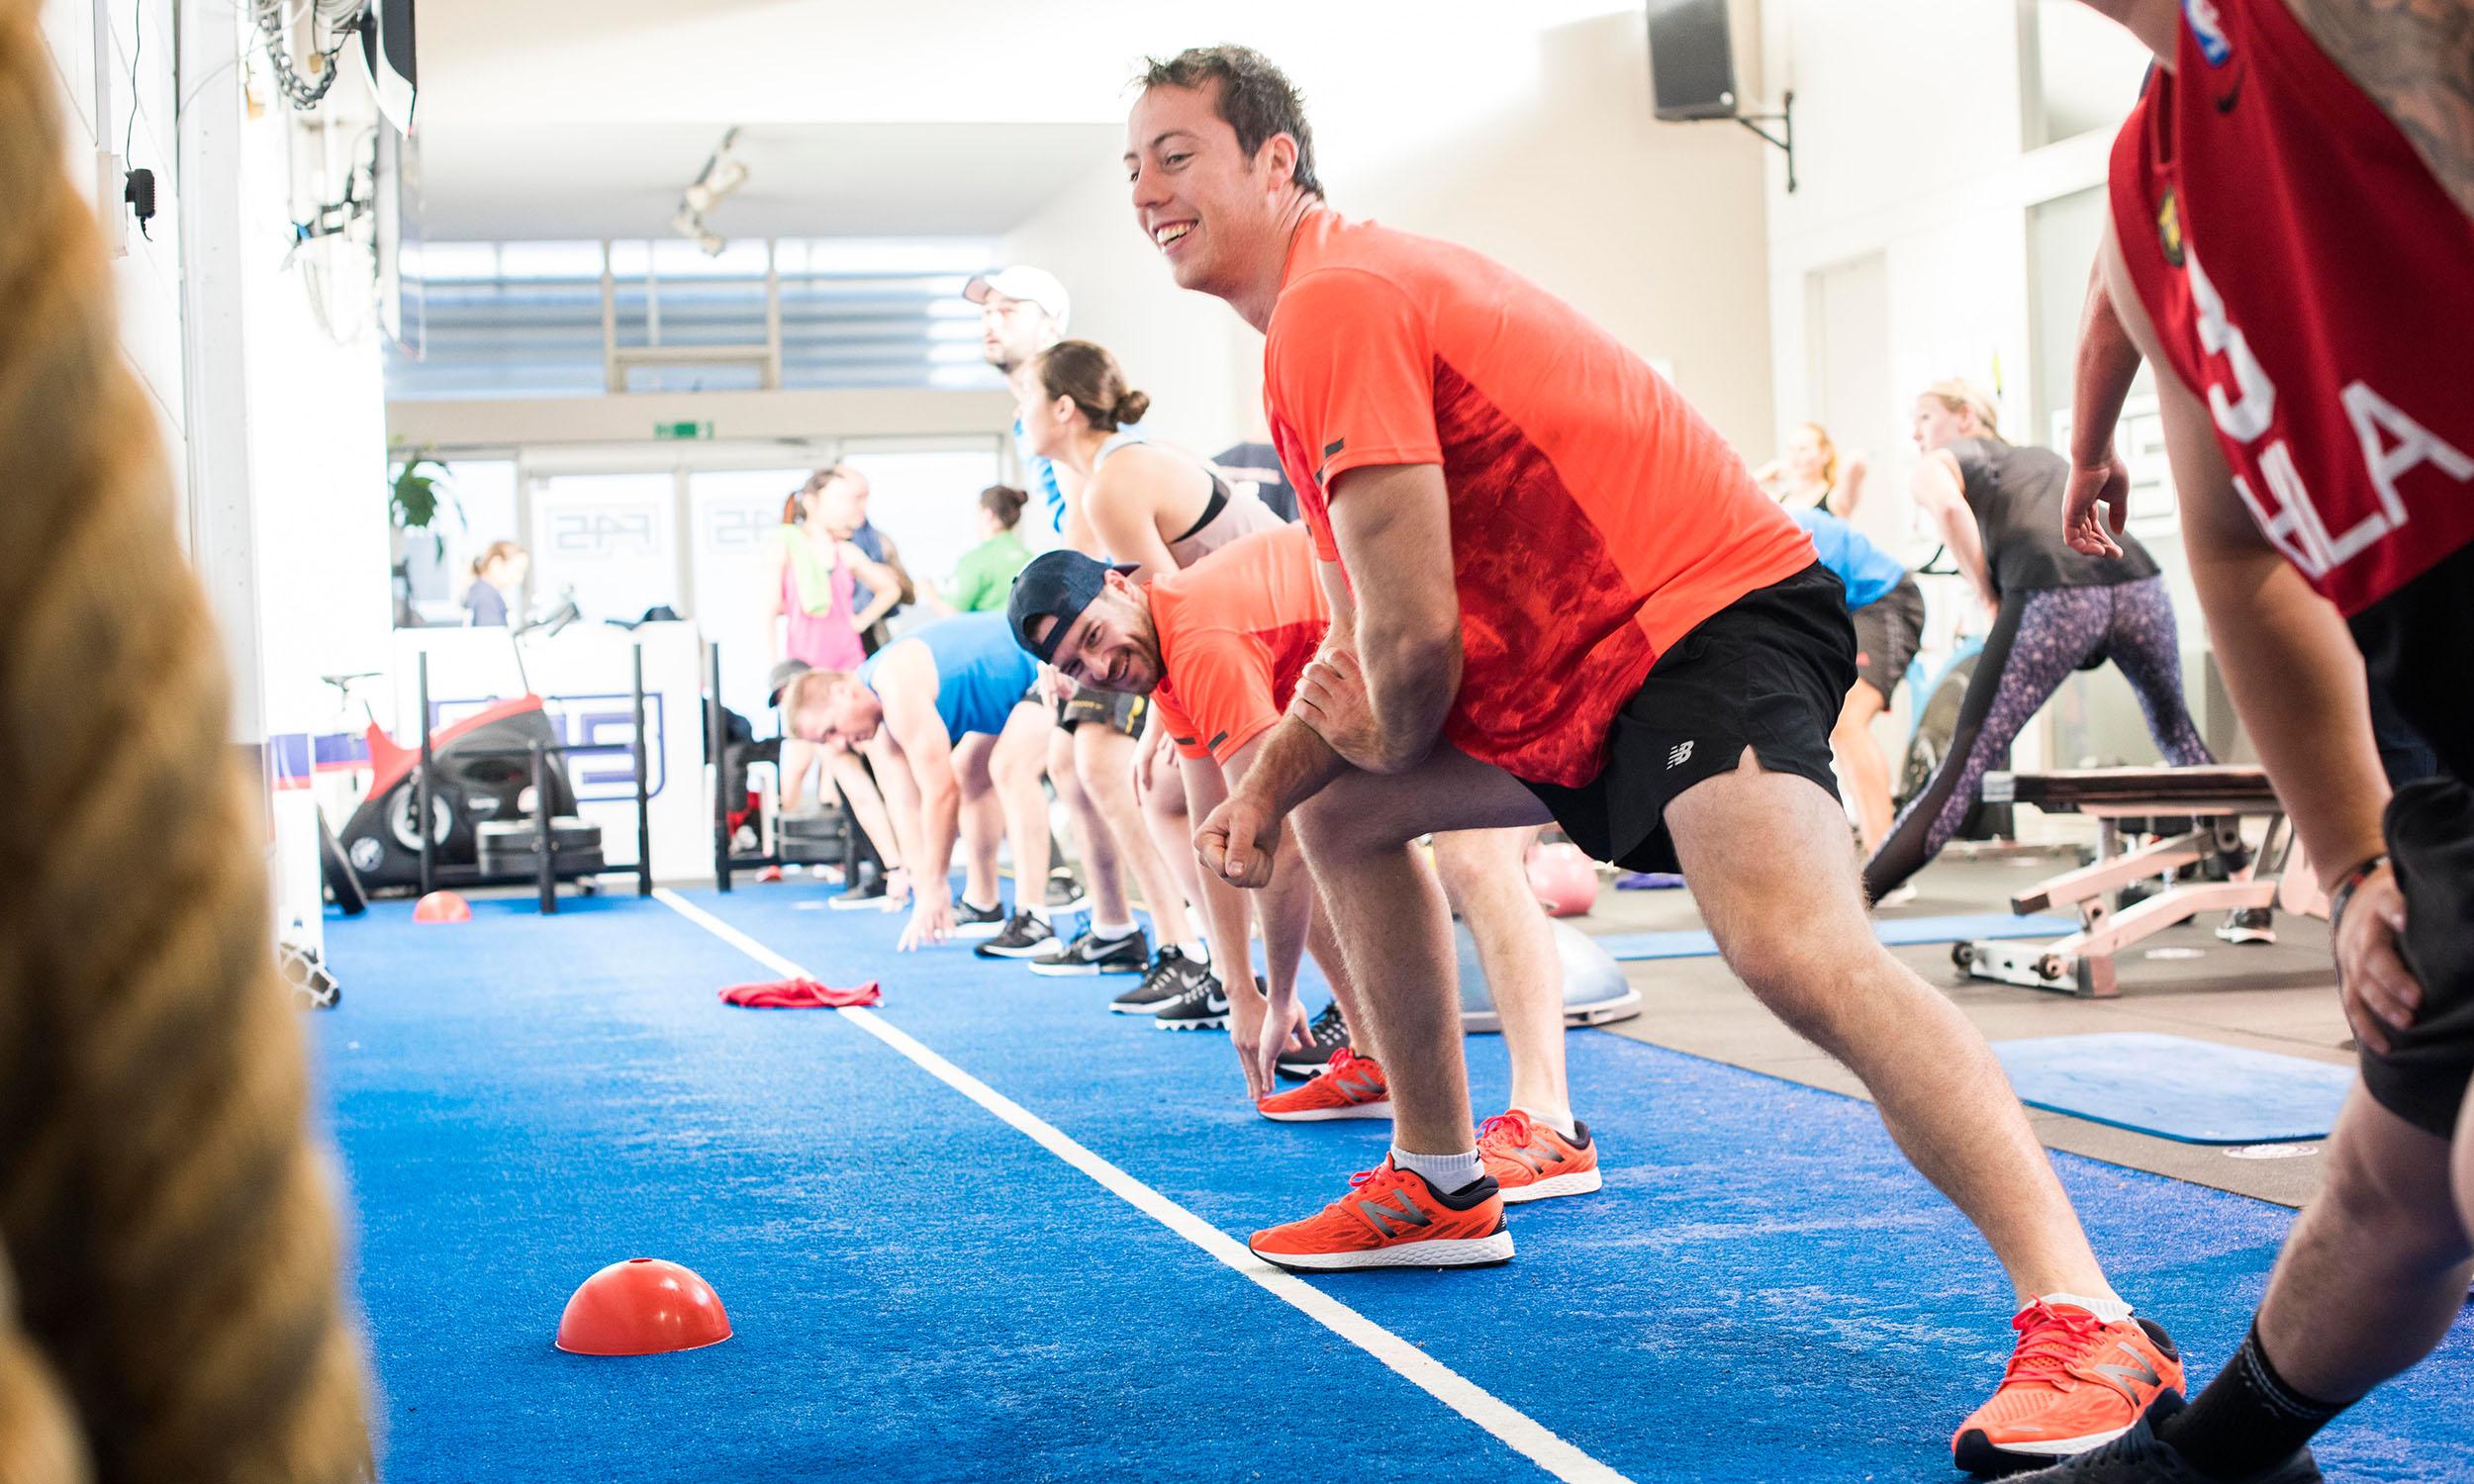 jaheb_barnett_mens_fasion_lifestyle_blogger_f45_training_newmarket